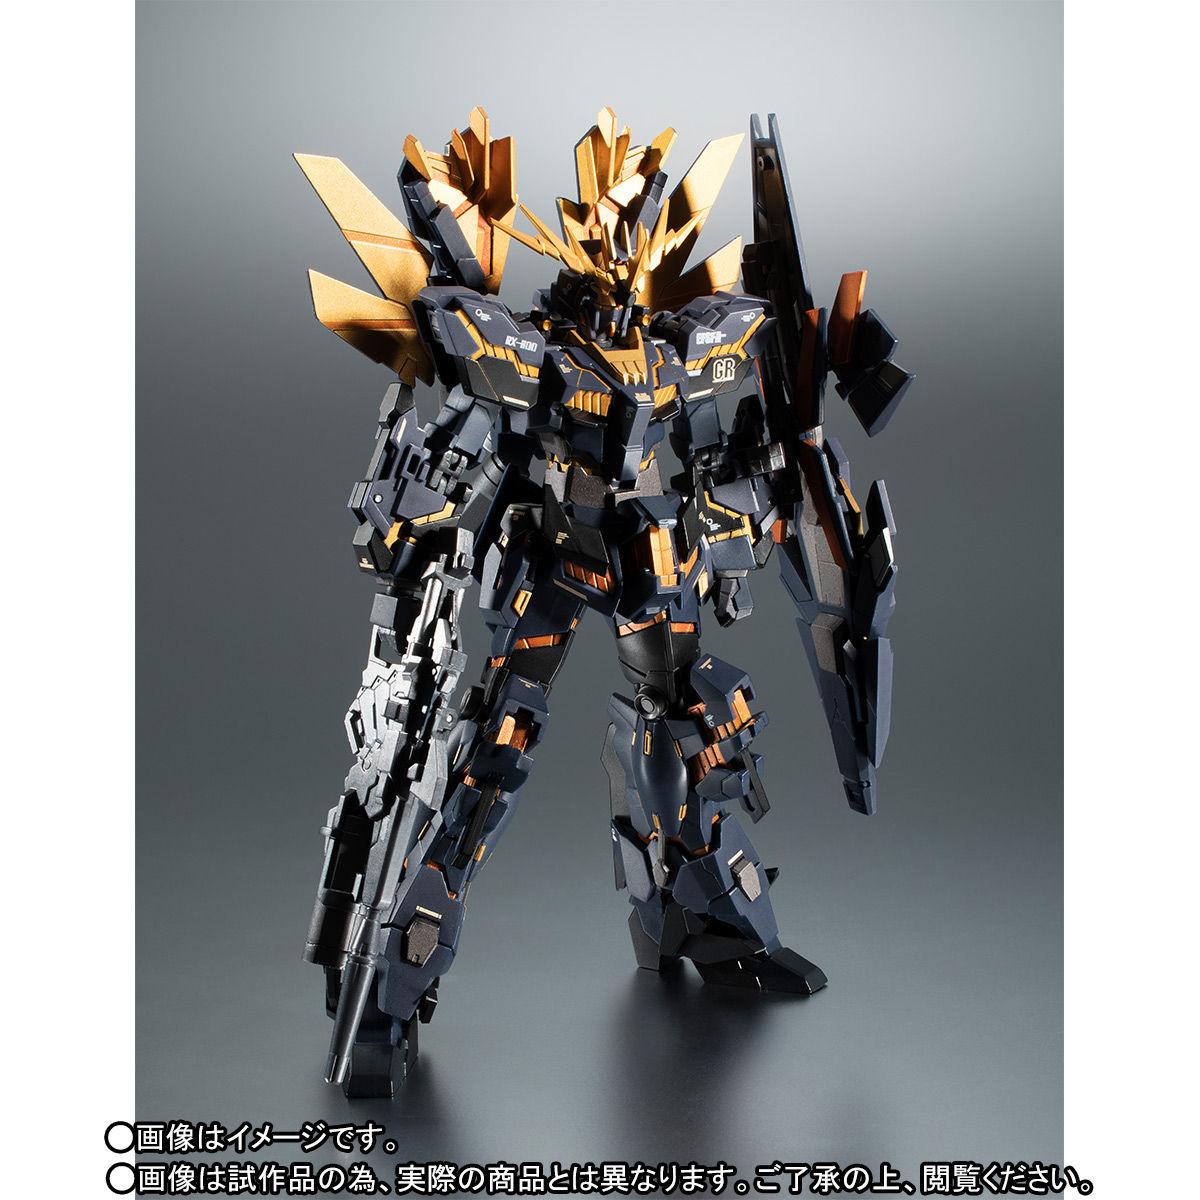 ROBOT魂〈SIDE MS〉『バンシィ・ノルン SPパック リアルマーキングVer.』可動フィギュア-005